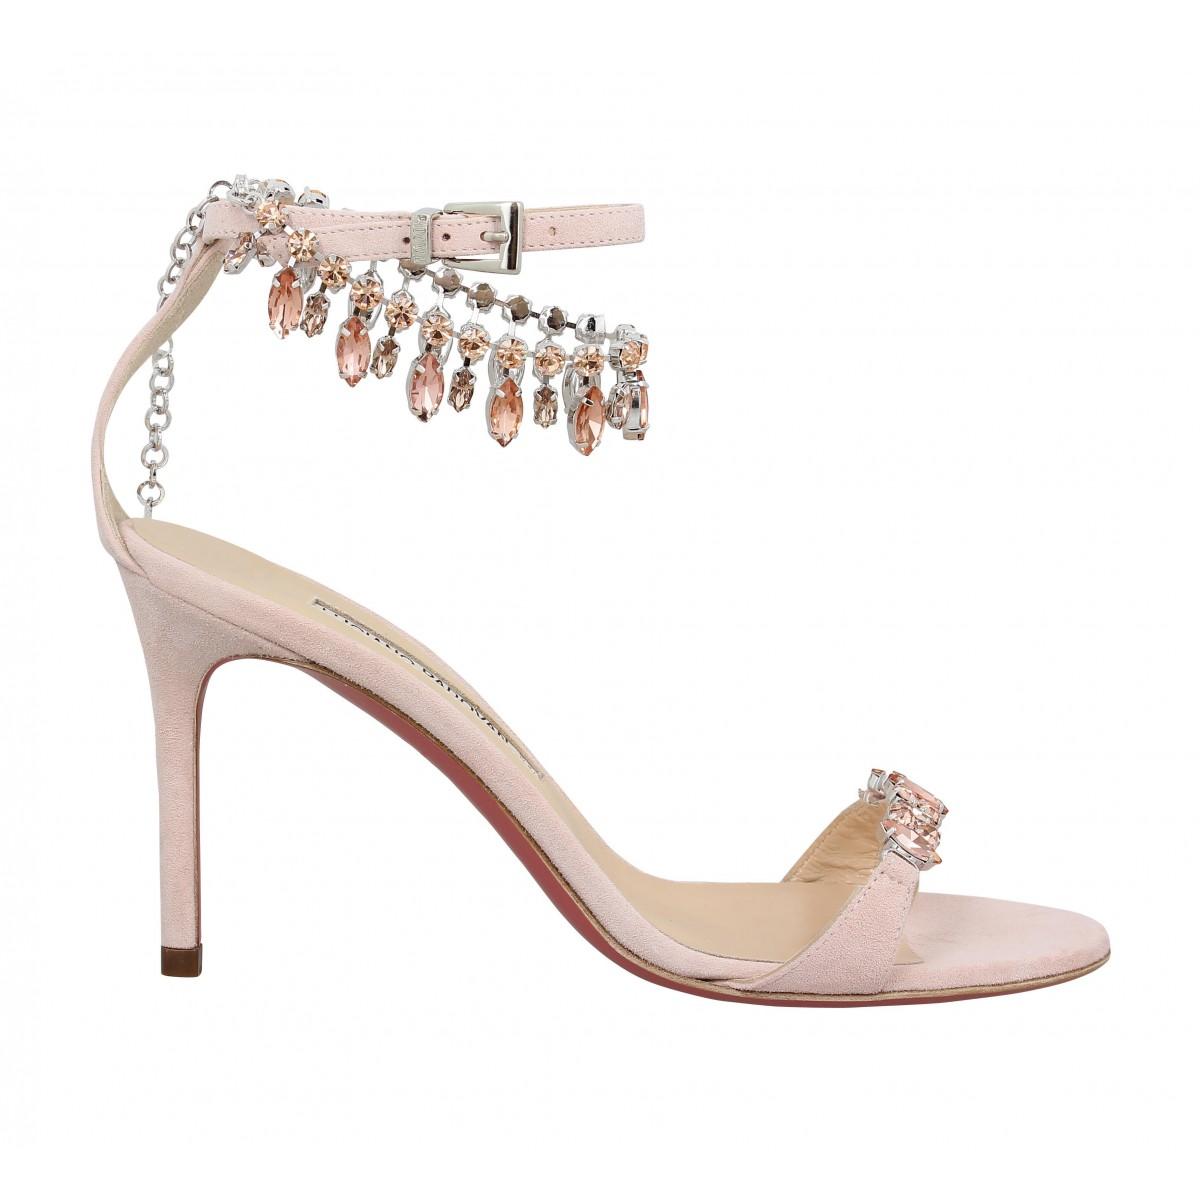 Chaussures - Bas-tops Et Baskets Luciano Padovan uYsJ32gNN